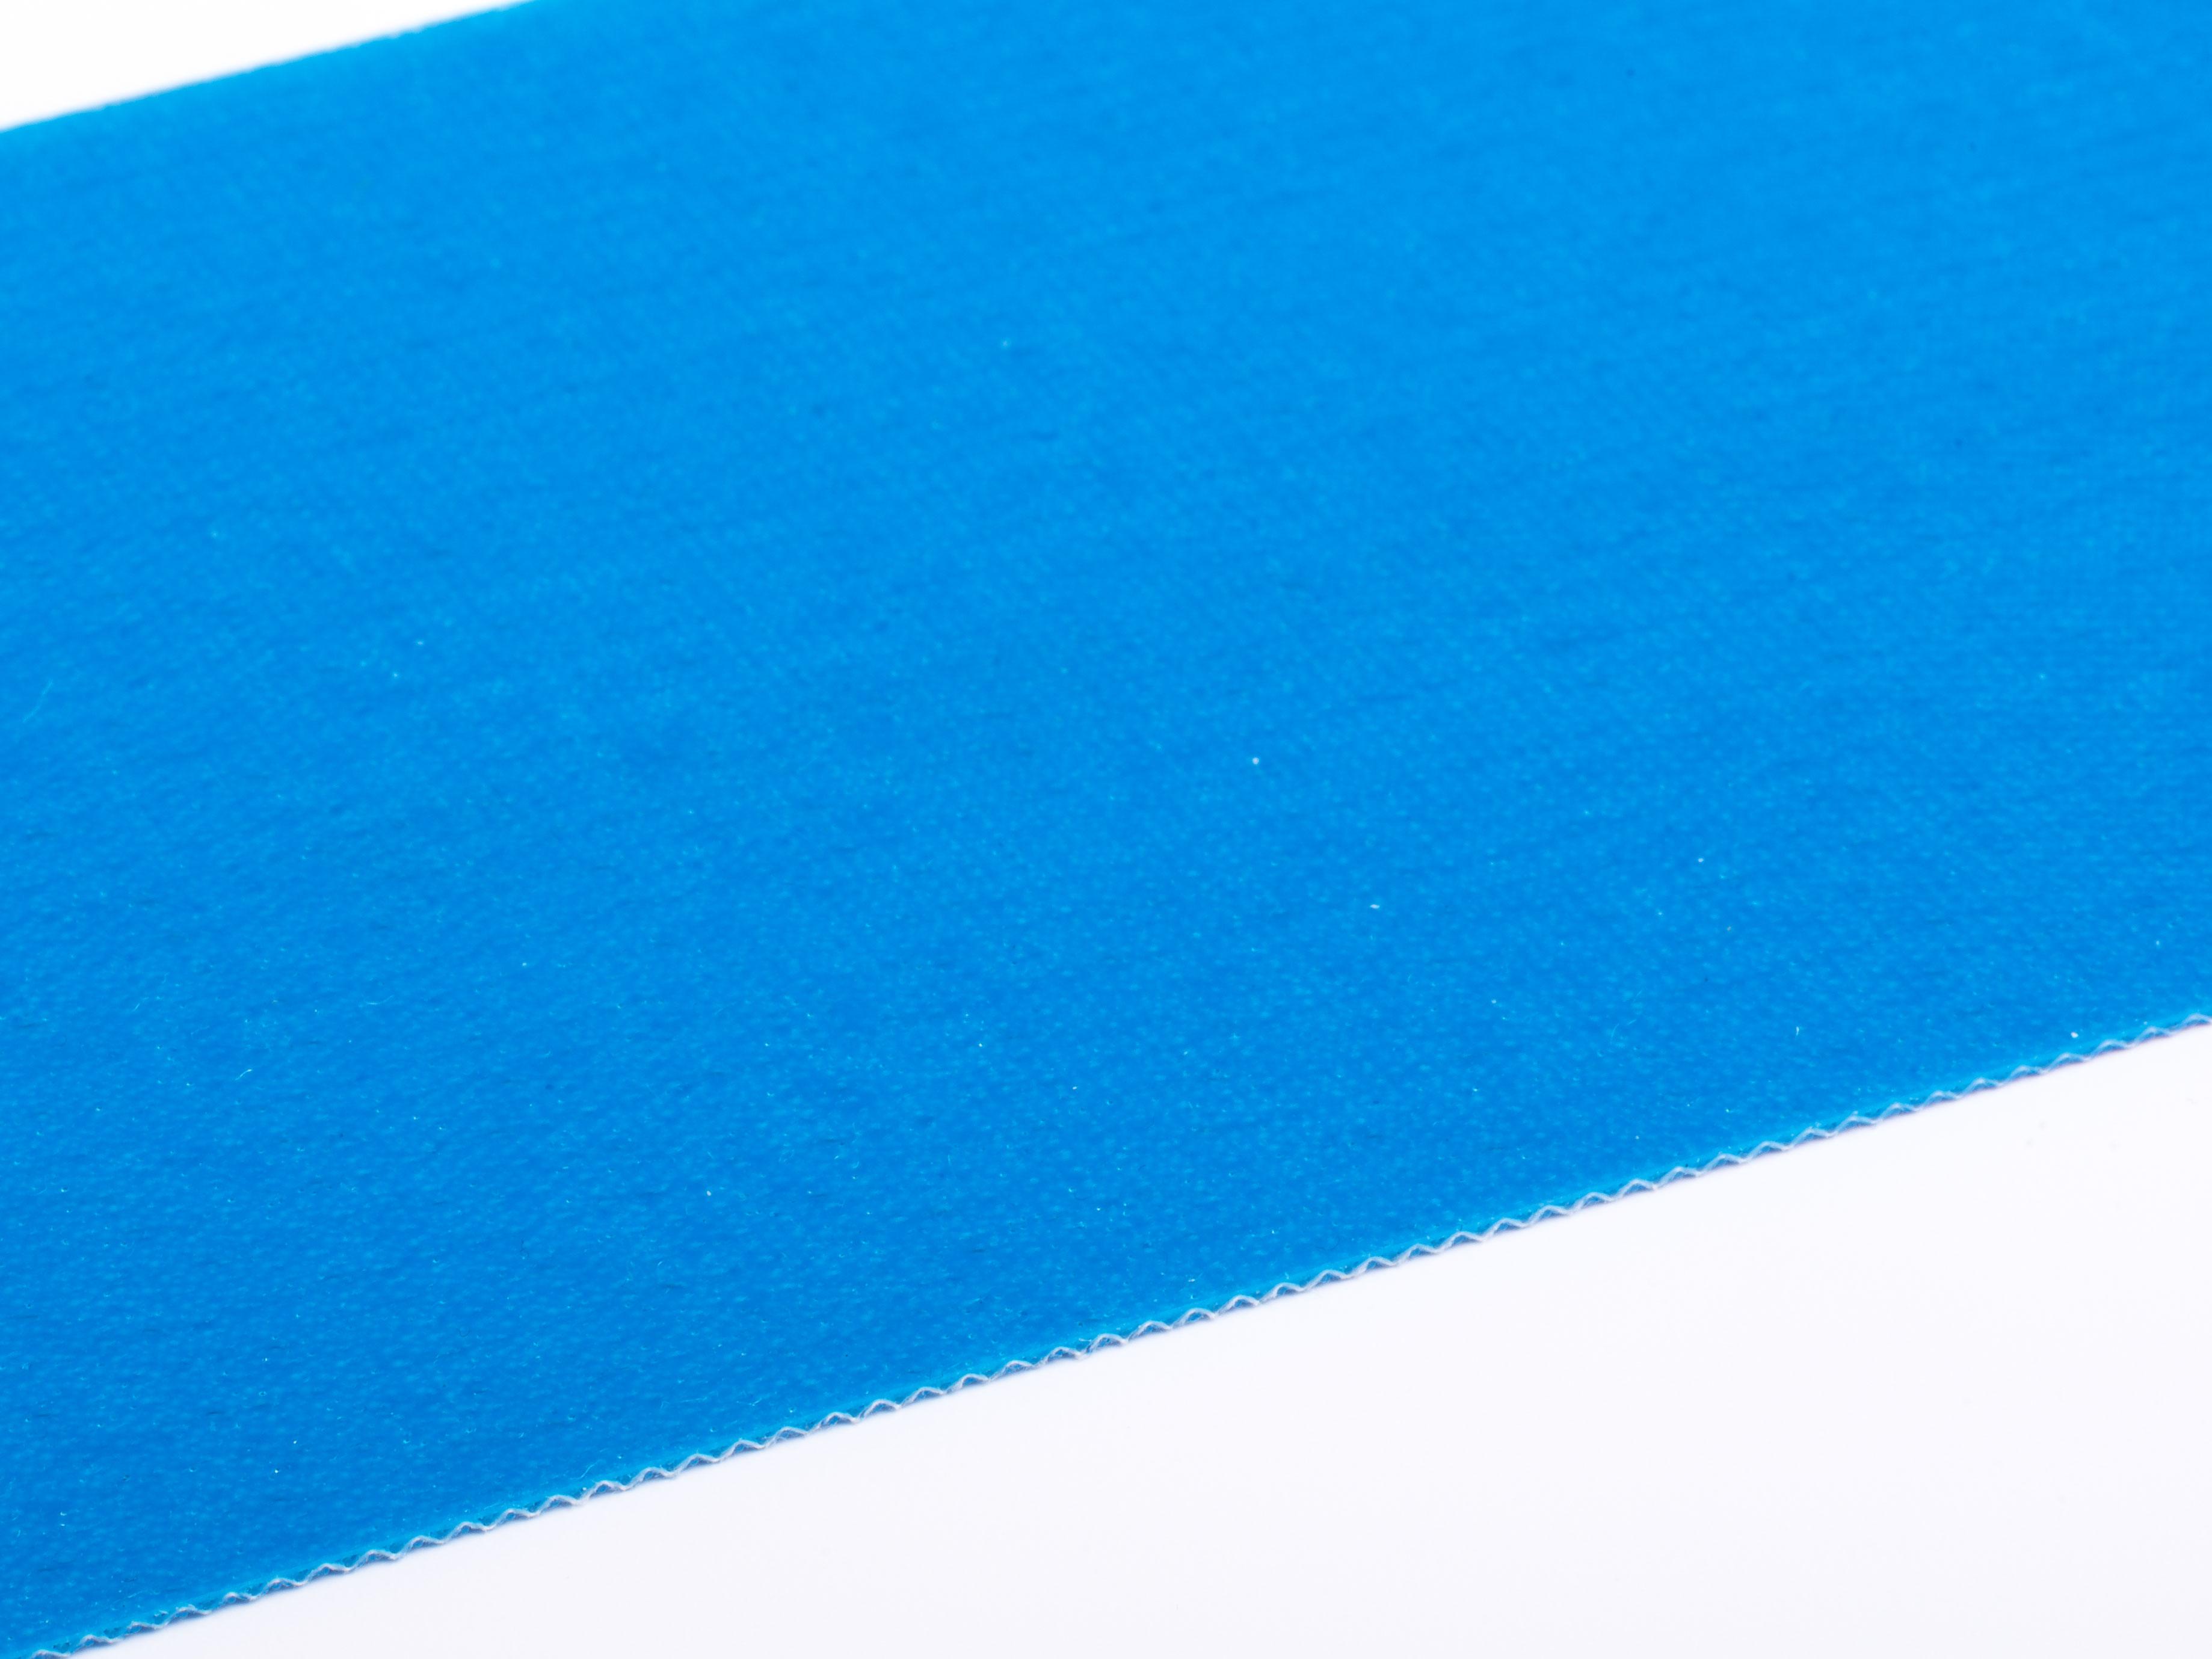 E 3/1 U0/S3 HACCP-FF blau FDA